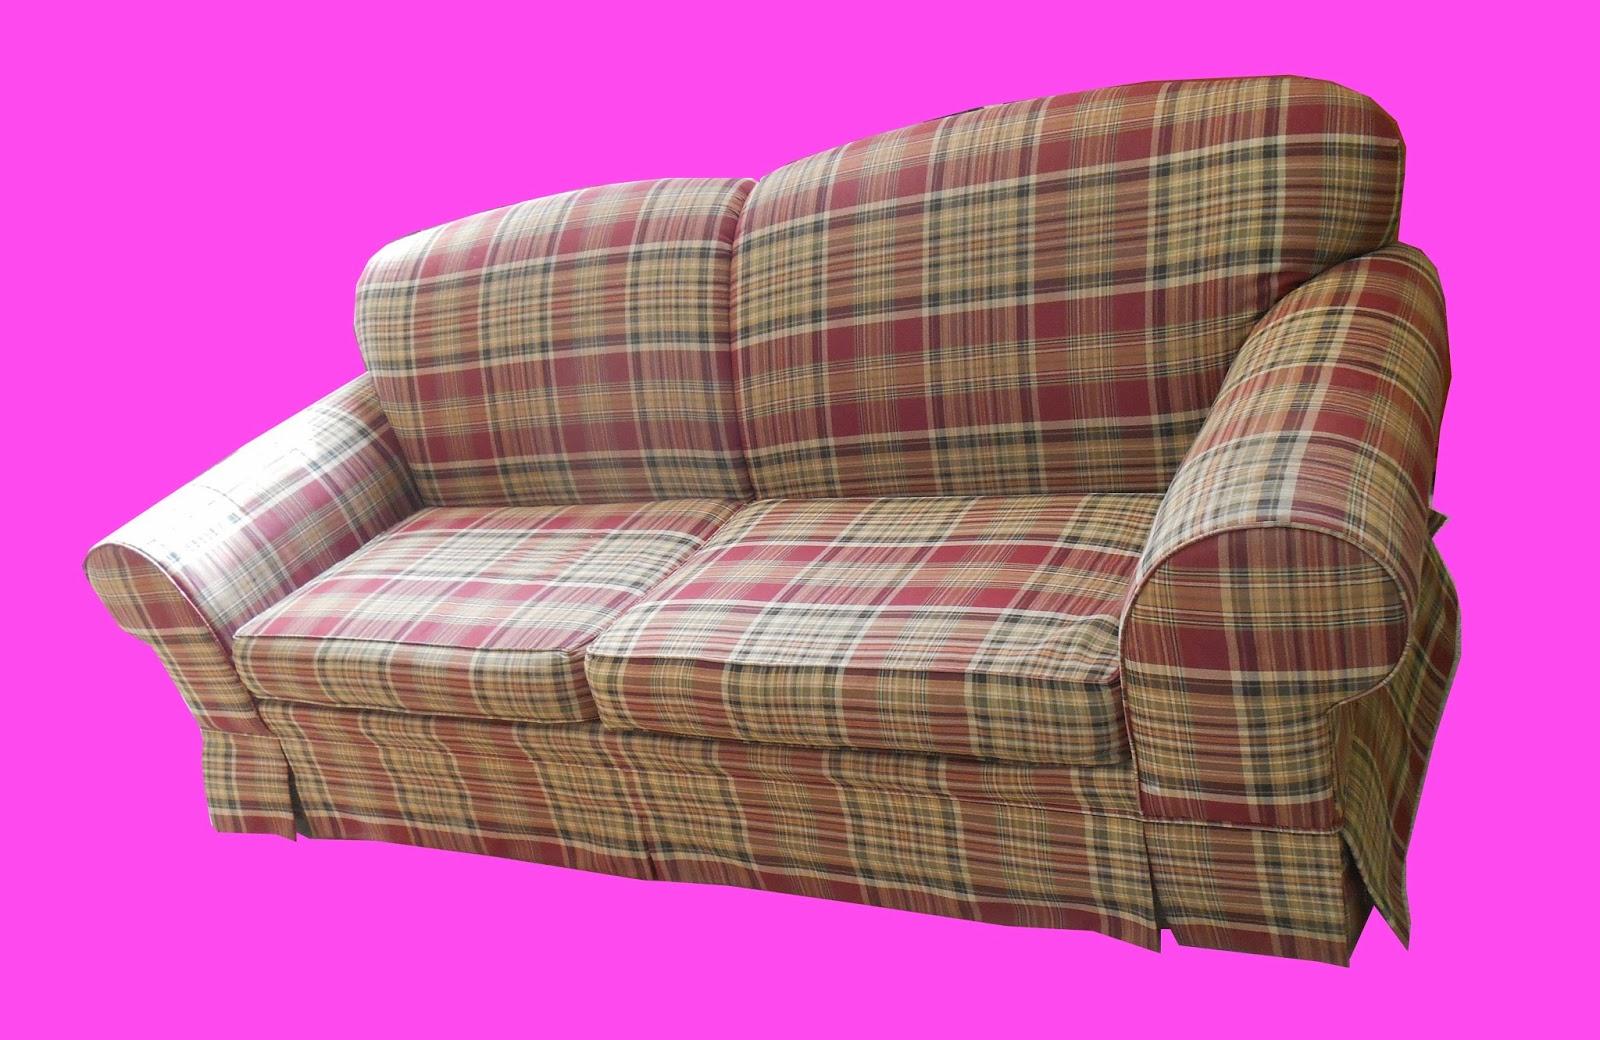 Uhuru Furniture & Collectibles: Plaid Sofa SOLD